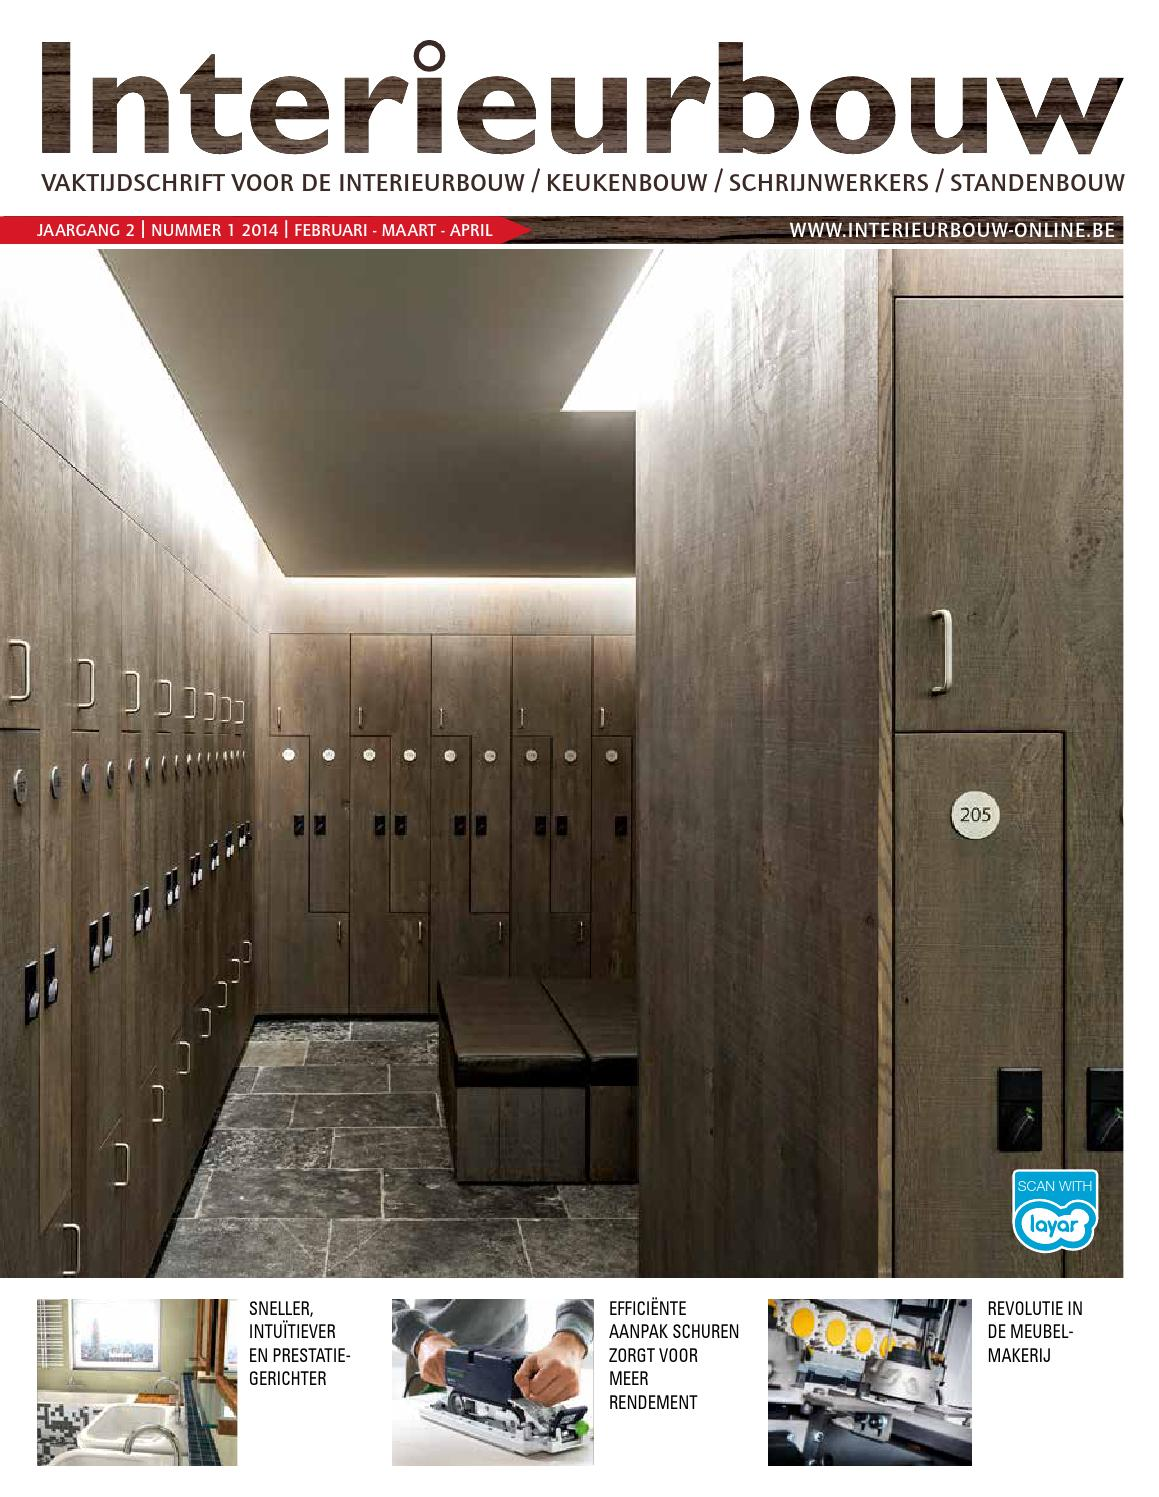 Interieurbouw 01 2015 by louwers uitgeversorganisatie bv   issuu